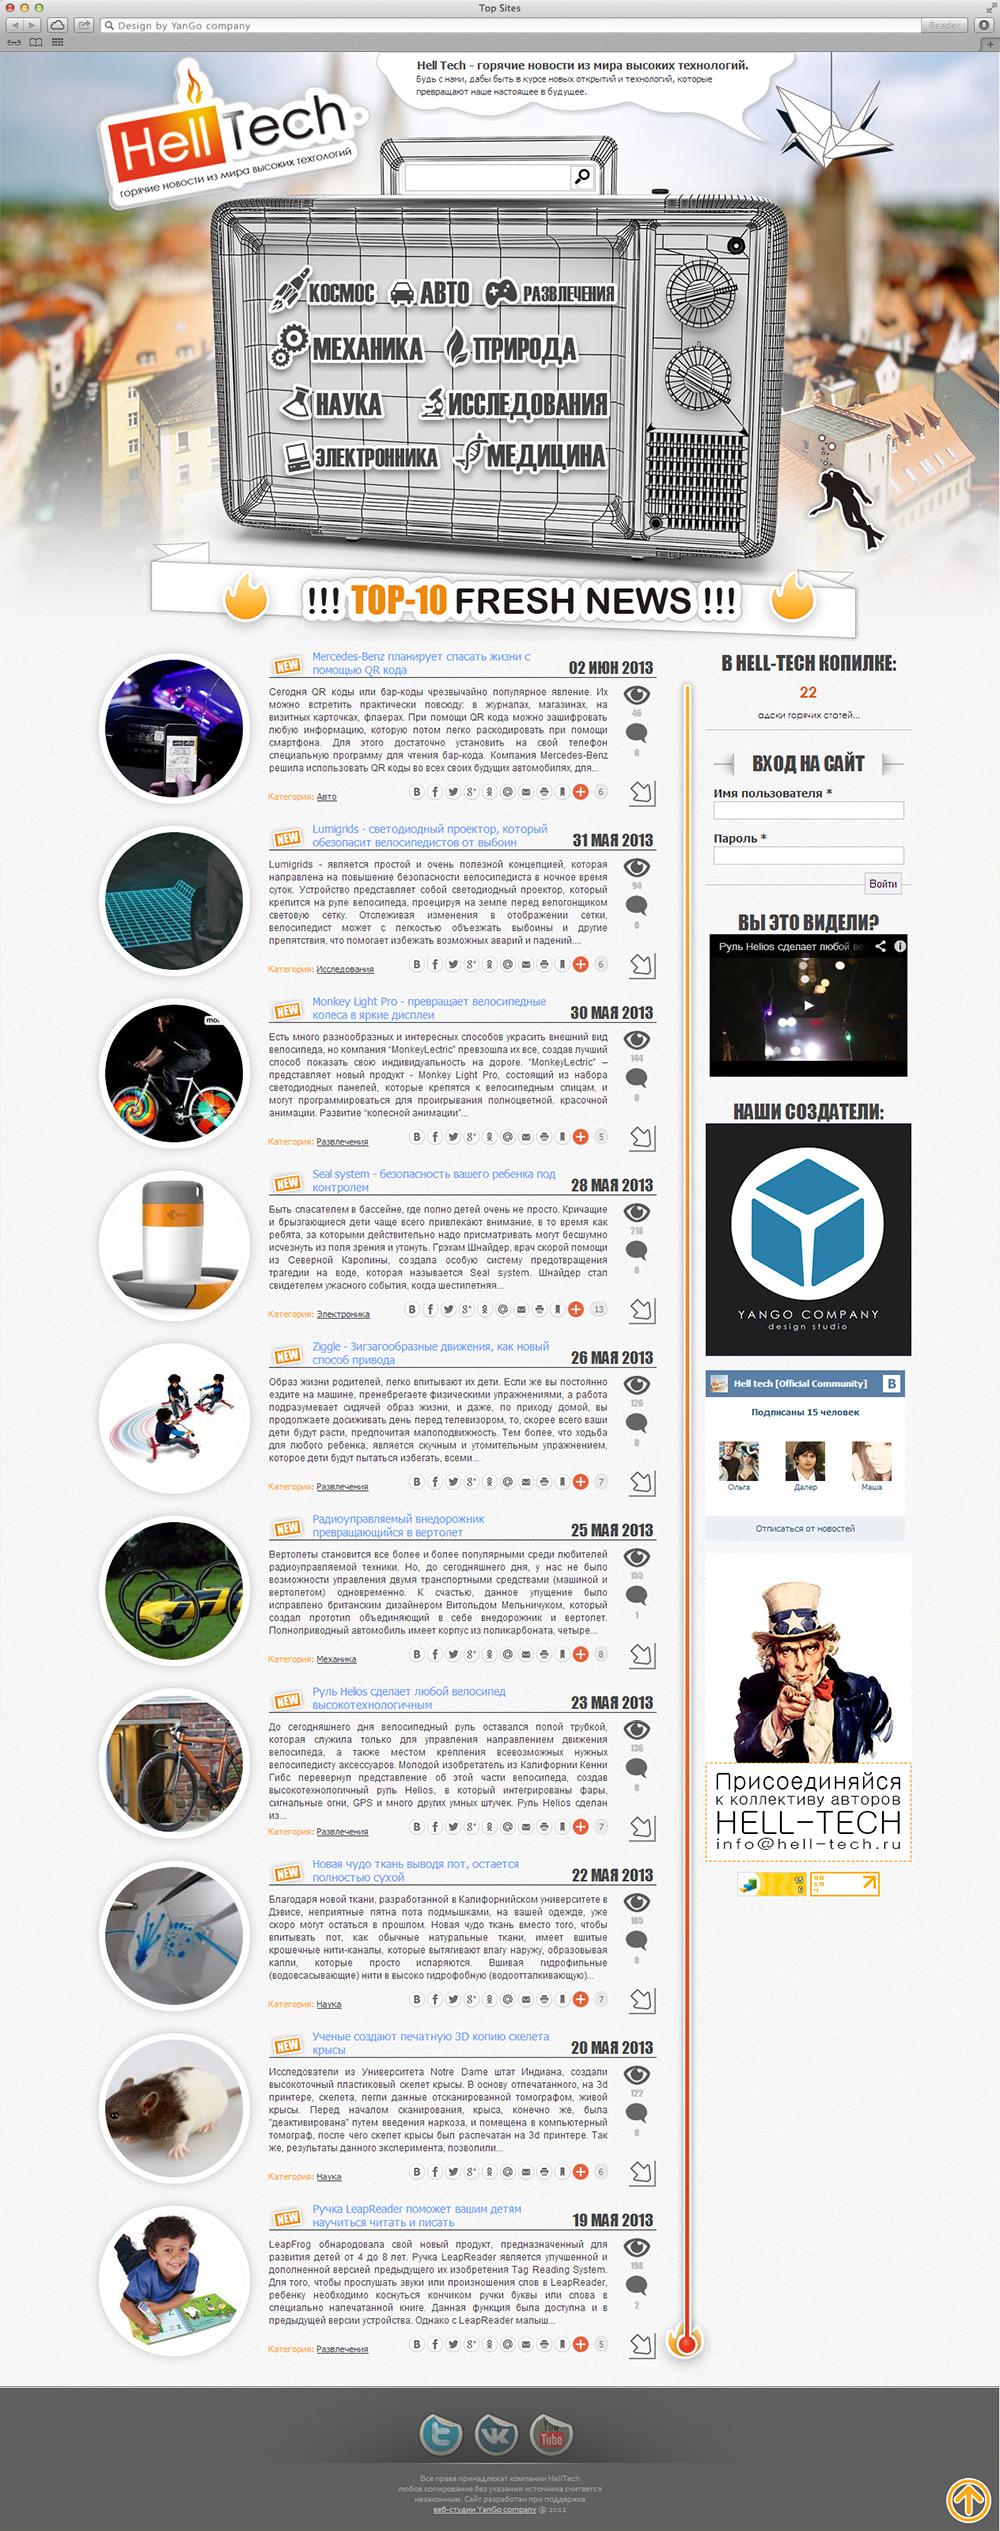 Информационный портал Hell Tech